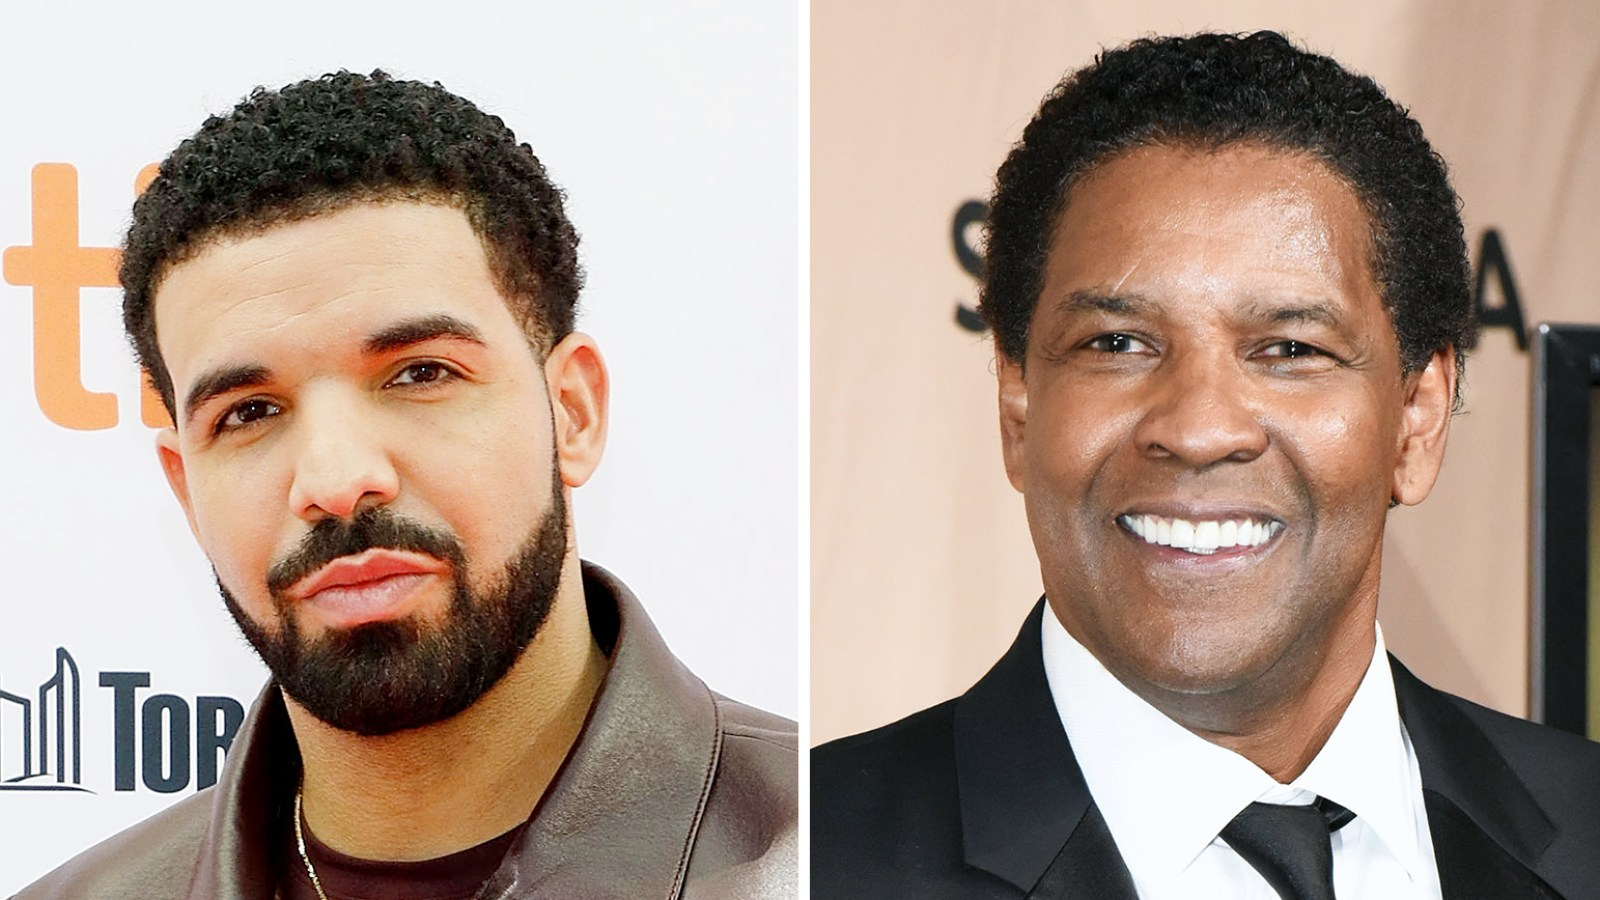 Drake Gets A Tattoo Of Denzel Washingtons Face